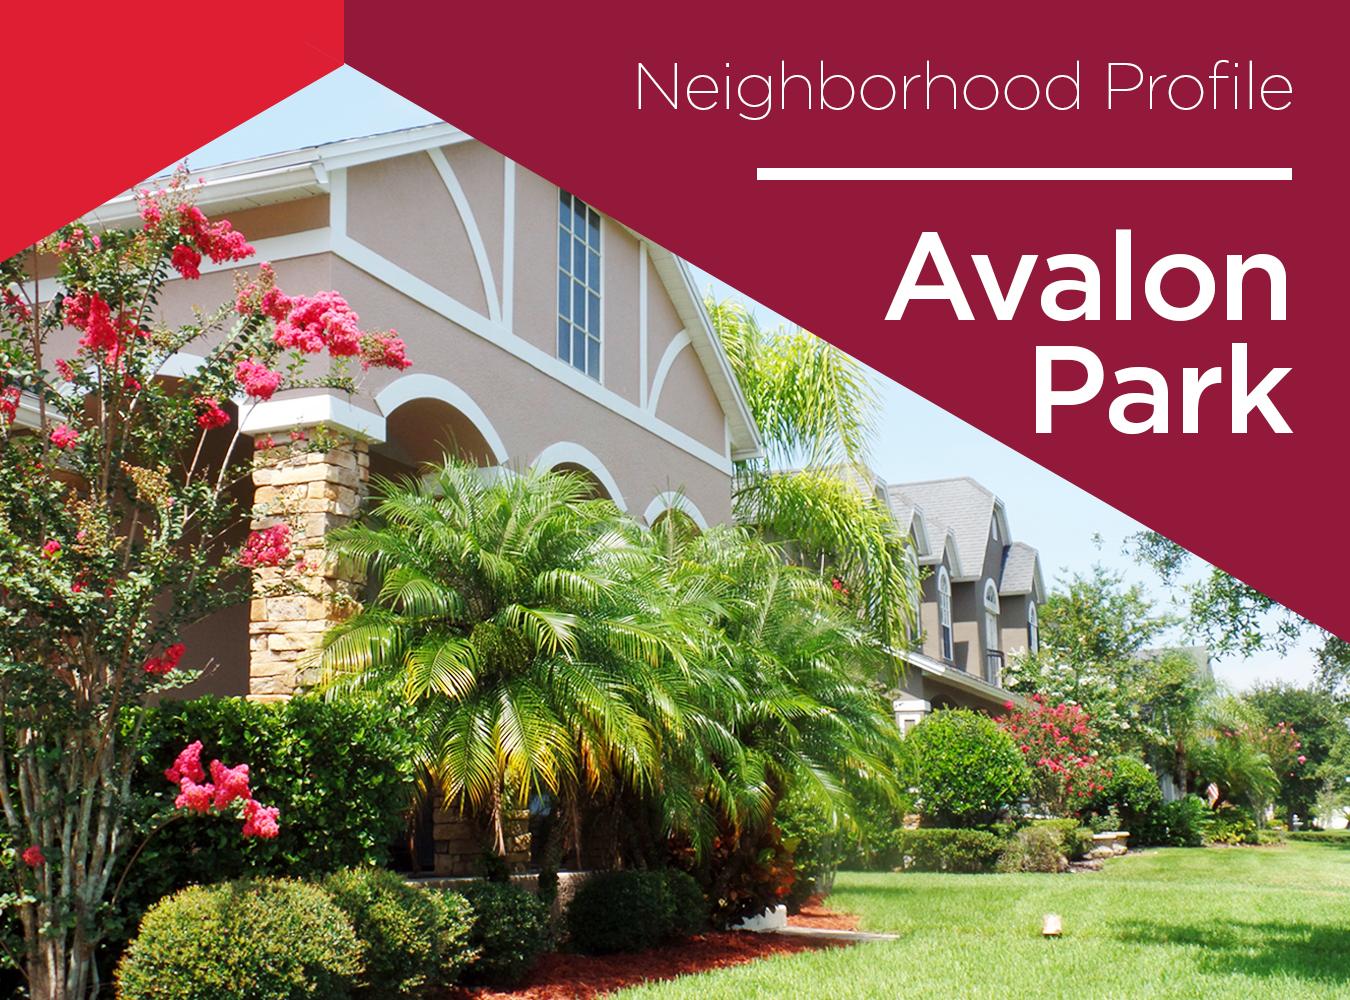 Avalon Park An Insiders Guide To Orlandos Hometown Neighborhood